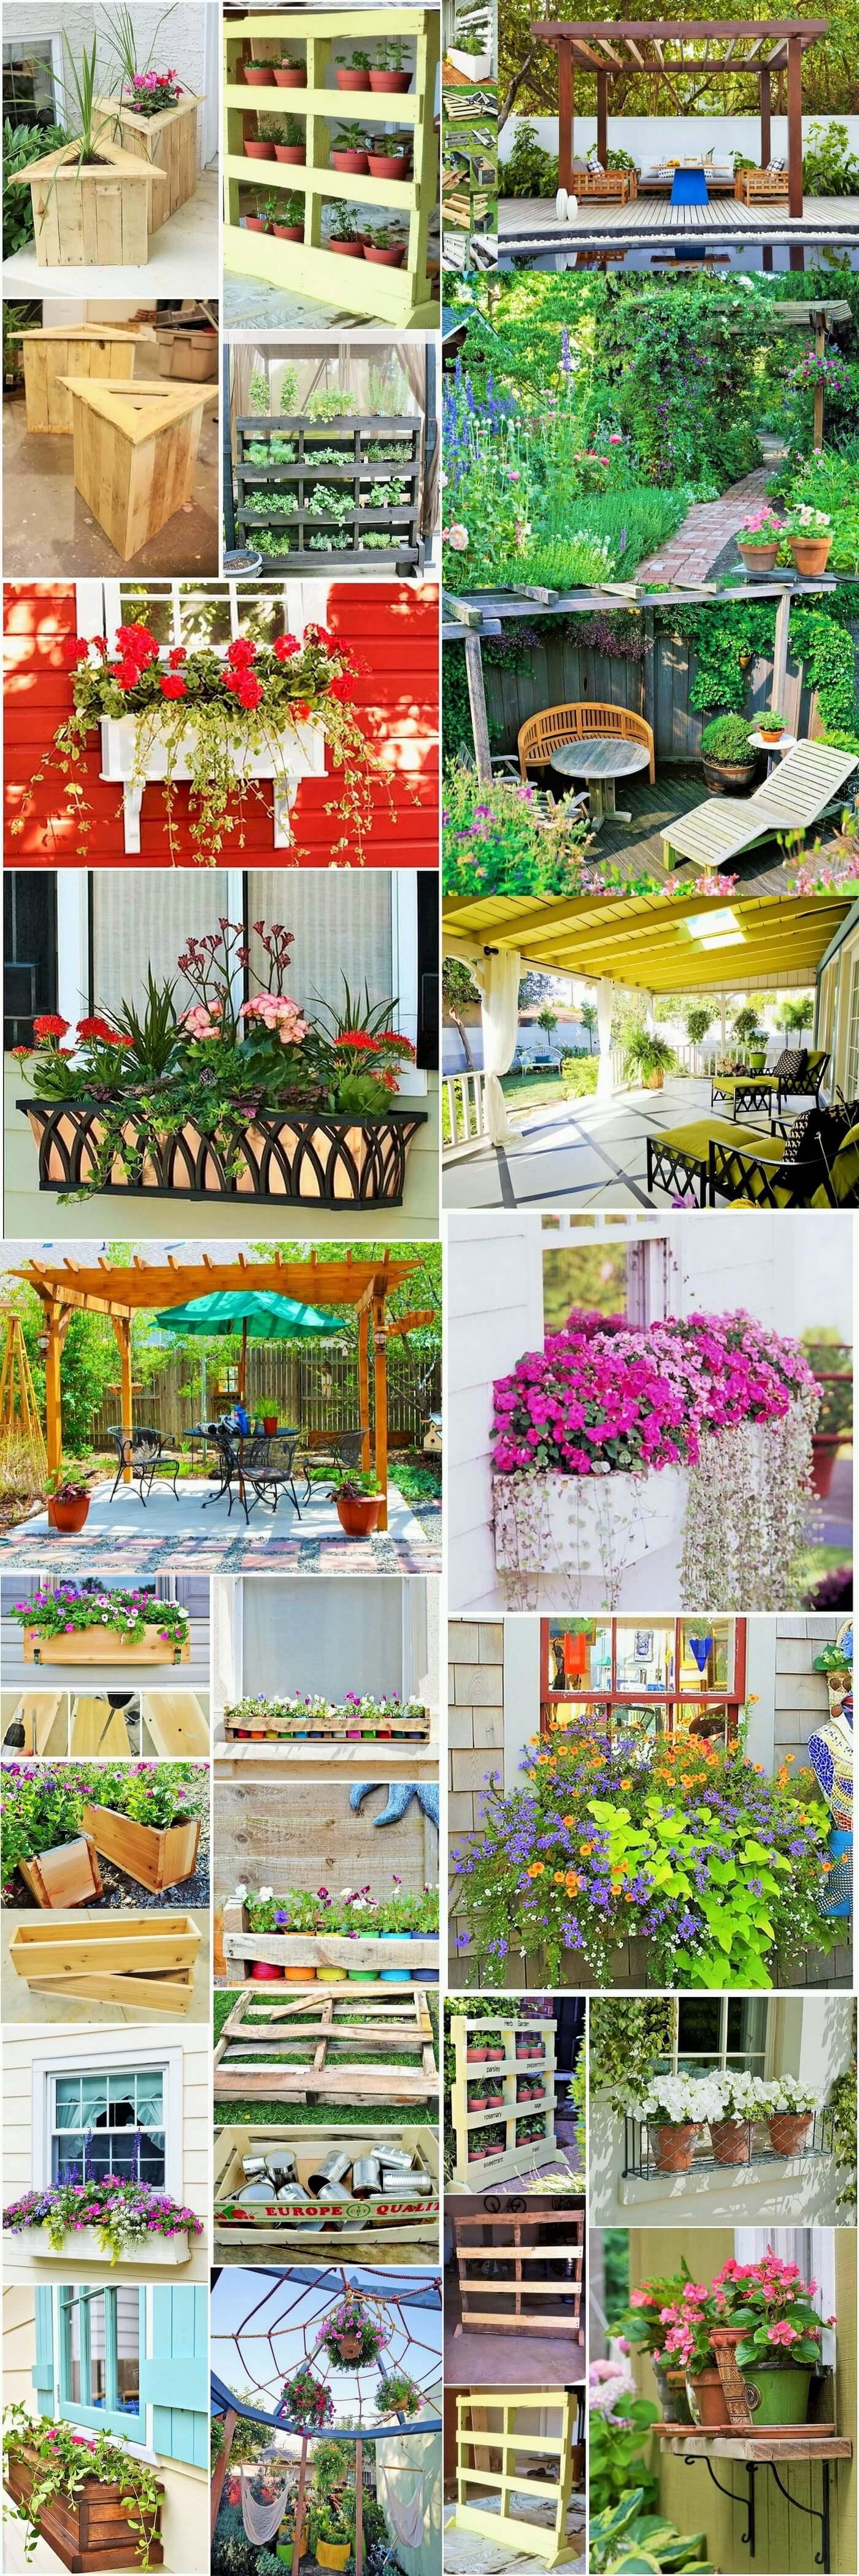 Garden Decorition ideas